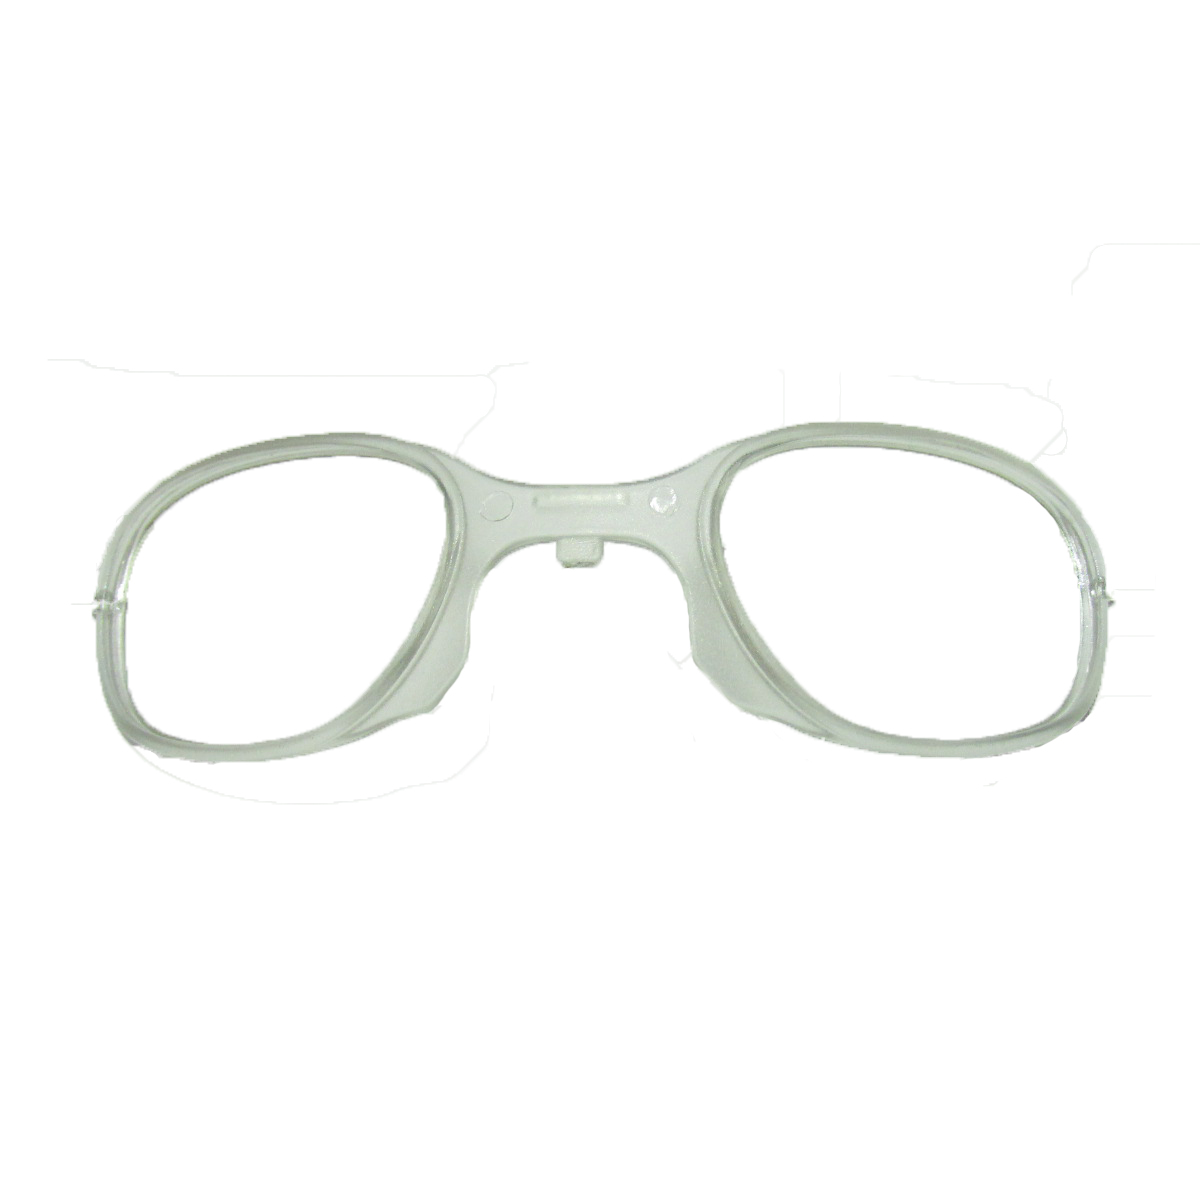 Clip Para Óculos De Futebol Tech  - Casafaz